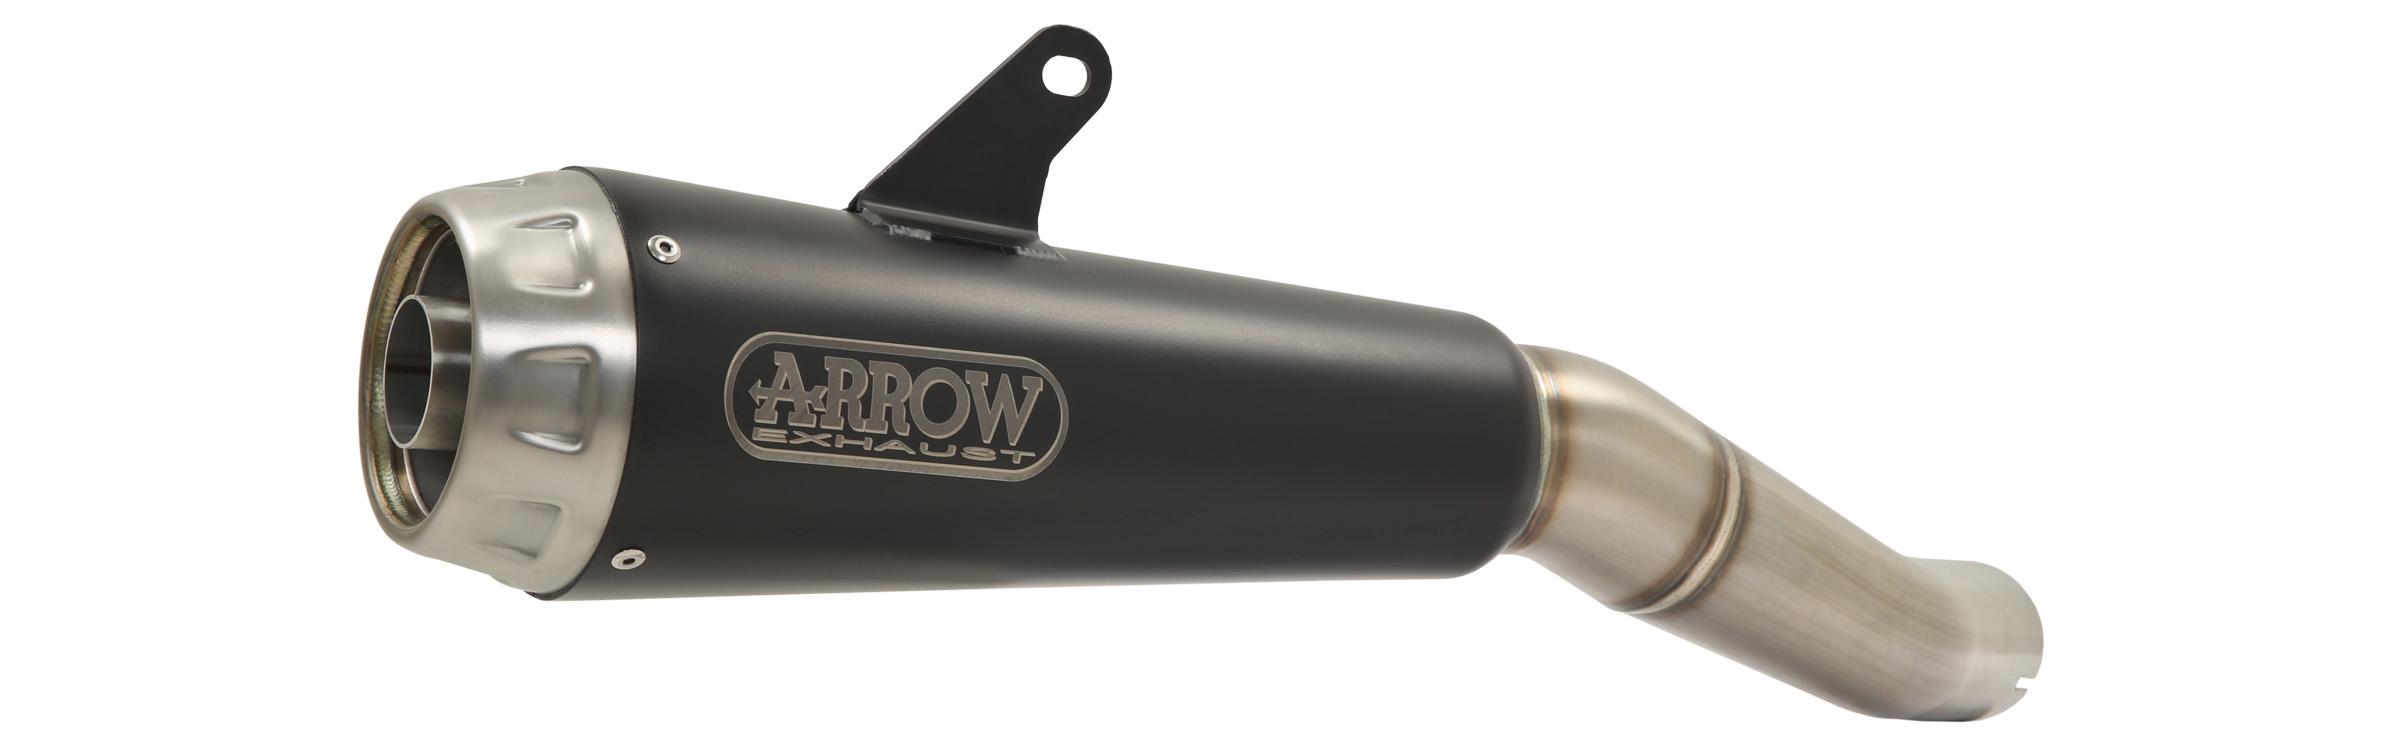 ARROW Auspuff DARK PRO-RACE für Kawasaki Z650 / Ninja 650 2017-, Edelstahl schwarz (Nur mit ARROW Krümmer)